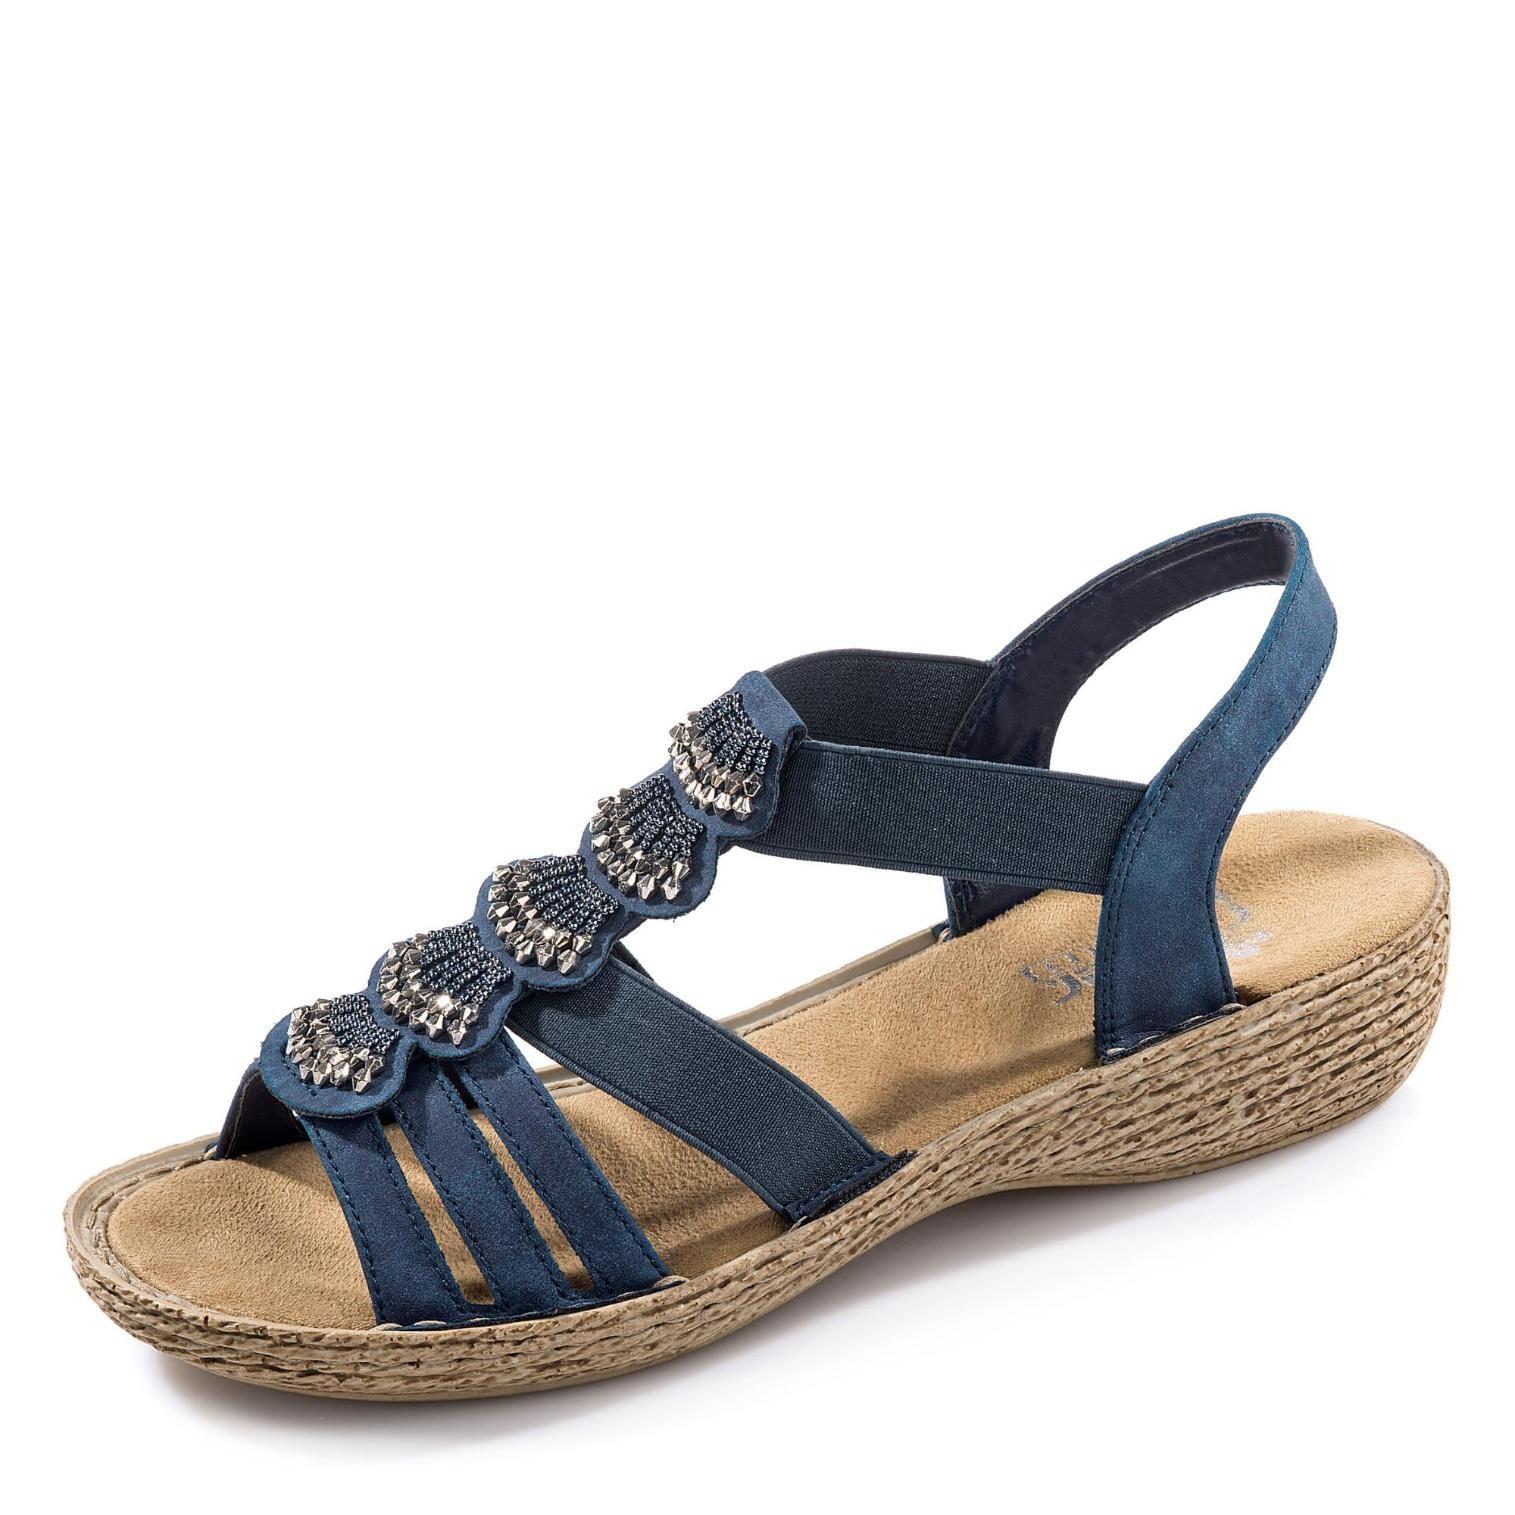 Rieker Sandale Blau Um 9 Reduziert Markenschuhe Sommerschuhe Marken Schuhe Markenschuhe